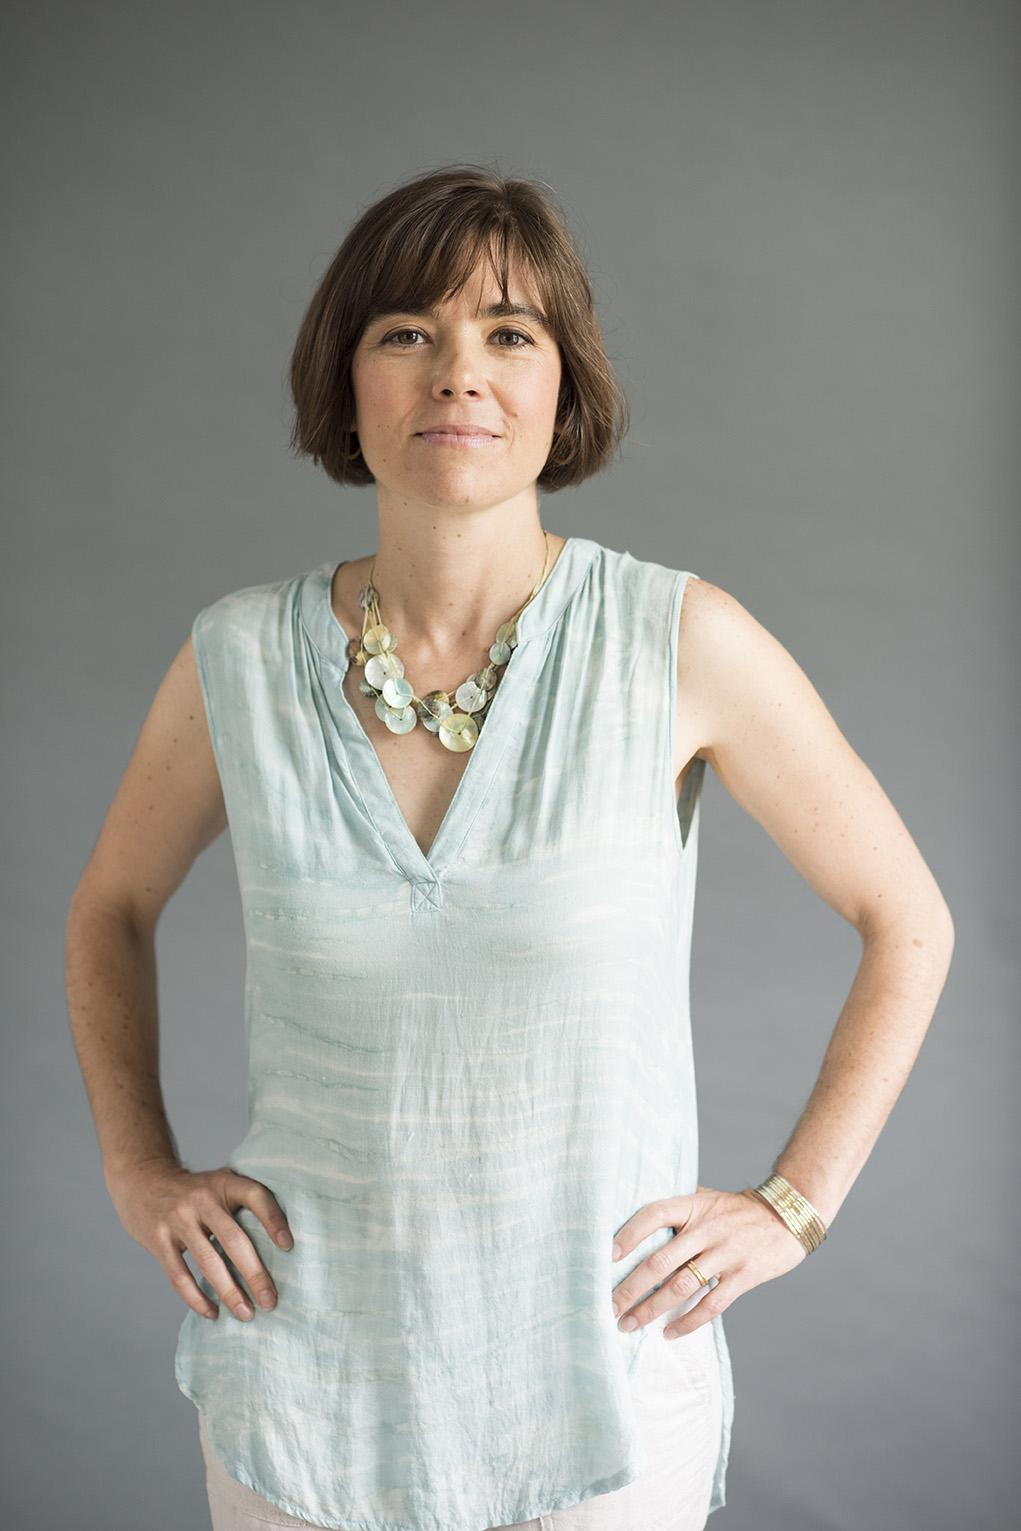 Elizabeth Frederick, technical writer